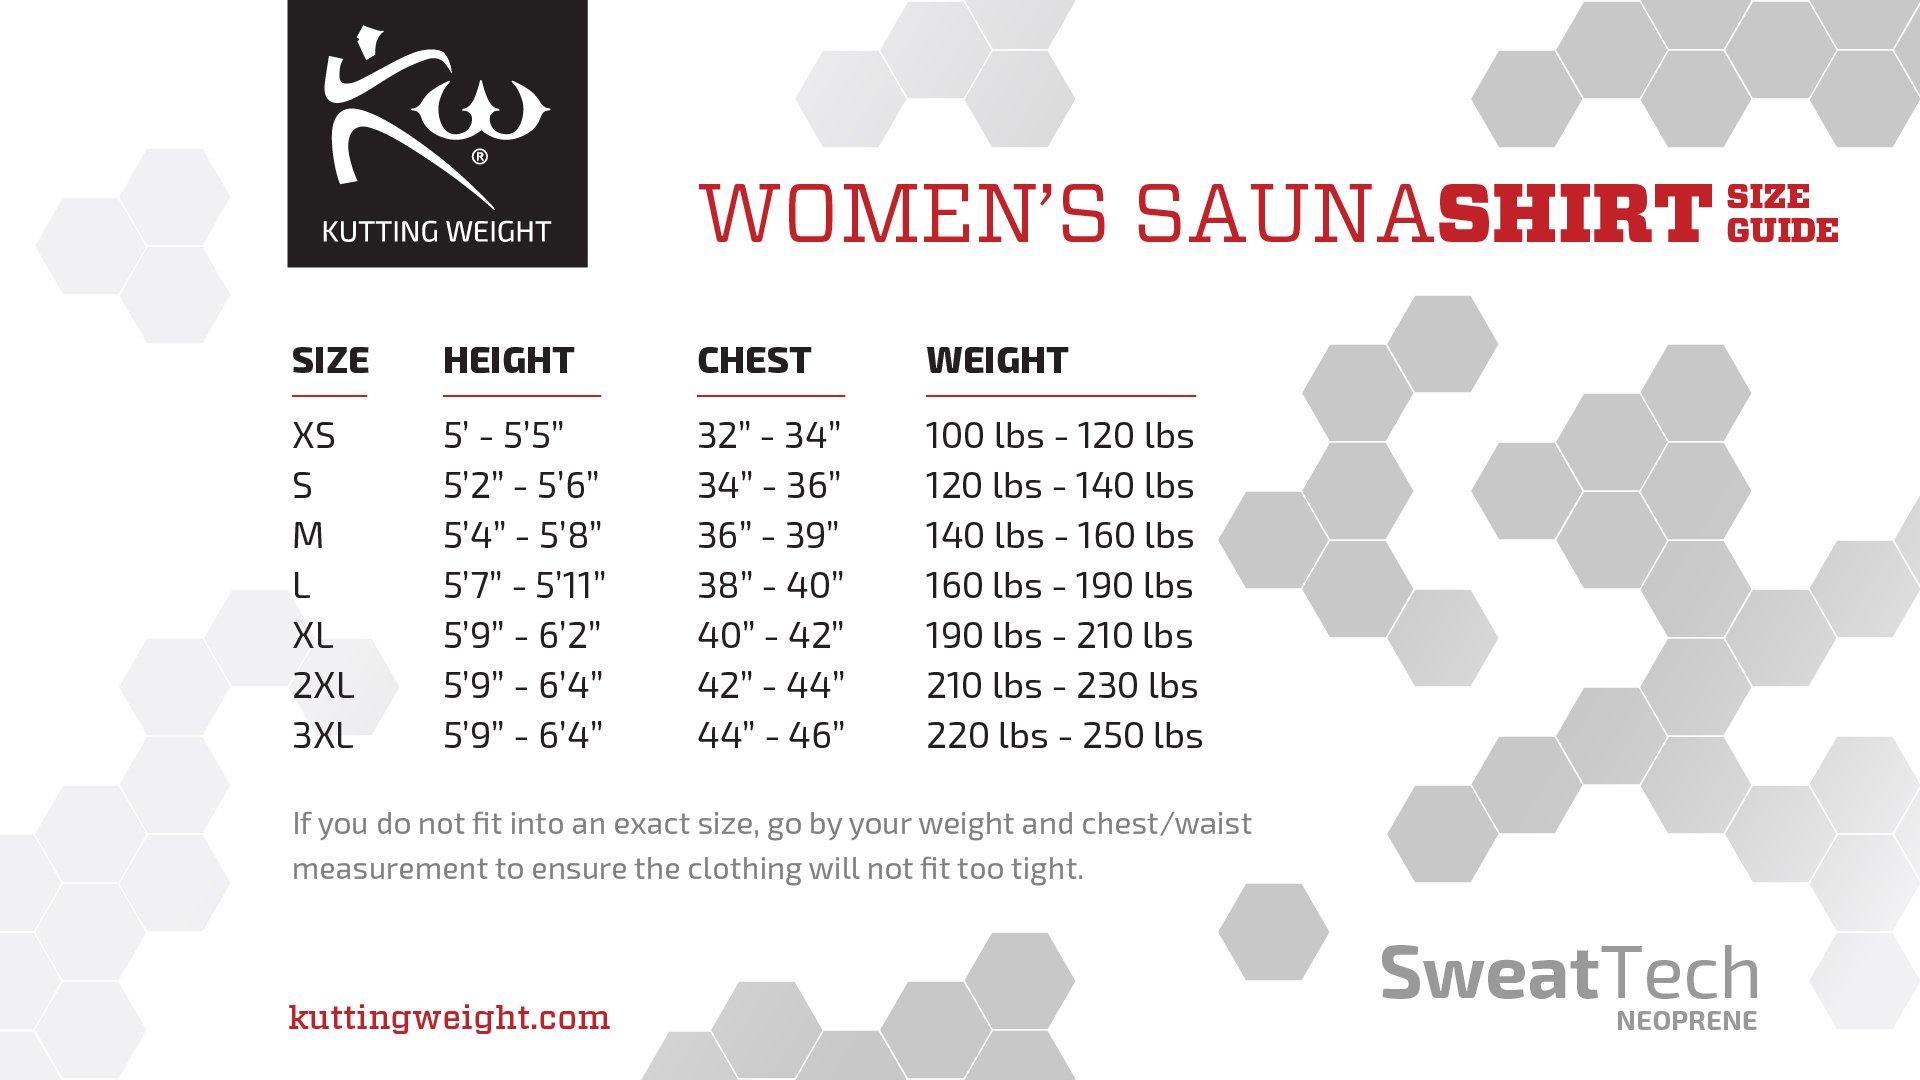 Women's - Kutting Weight (Cutting Weight) Neoprene Weight Loss Sauna Shirt (X-Small)